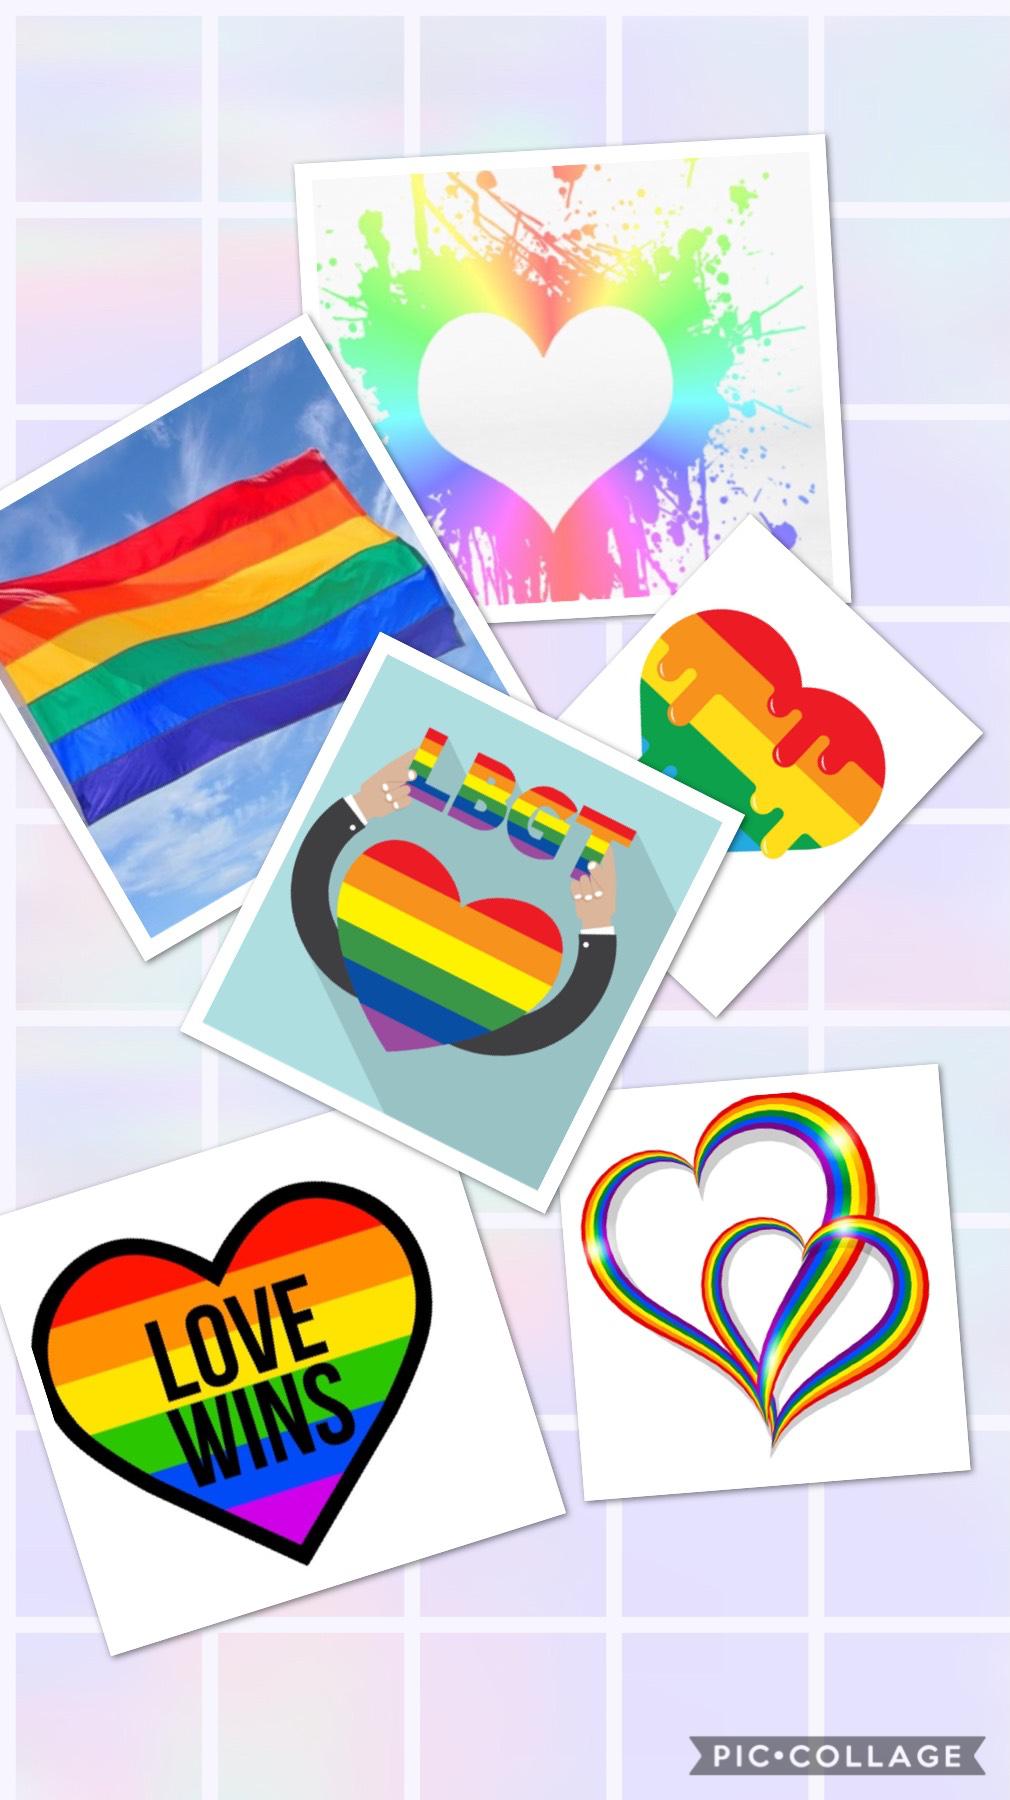 LGBT 🏳️🌈 🏳️🌈🏳️🌈🏳️🌈🏳️🌈🏳️🌈🏳️🌈🏳️🌈🏳️🌈🏳️🌈🏳️🌈🏳️🌈🏳️🌈🏳️🌈🏳️🌈🏳️🌈🏳️🌈🏳️🌈🏳️🌈🏳️🌈🏳️🌈🏳️🌈